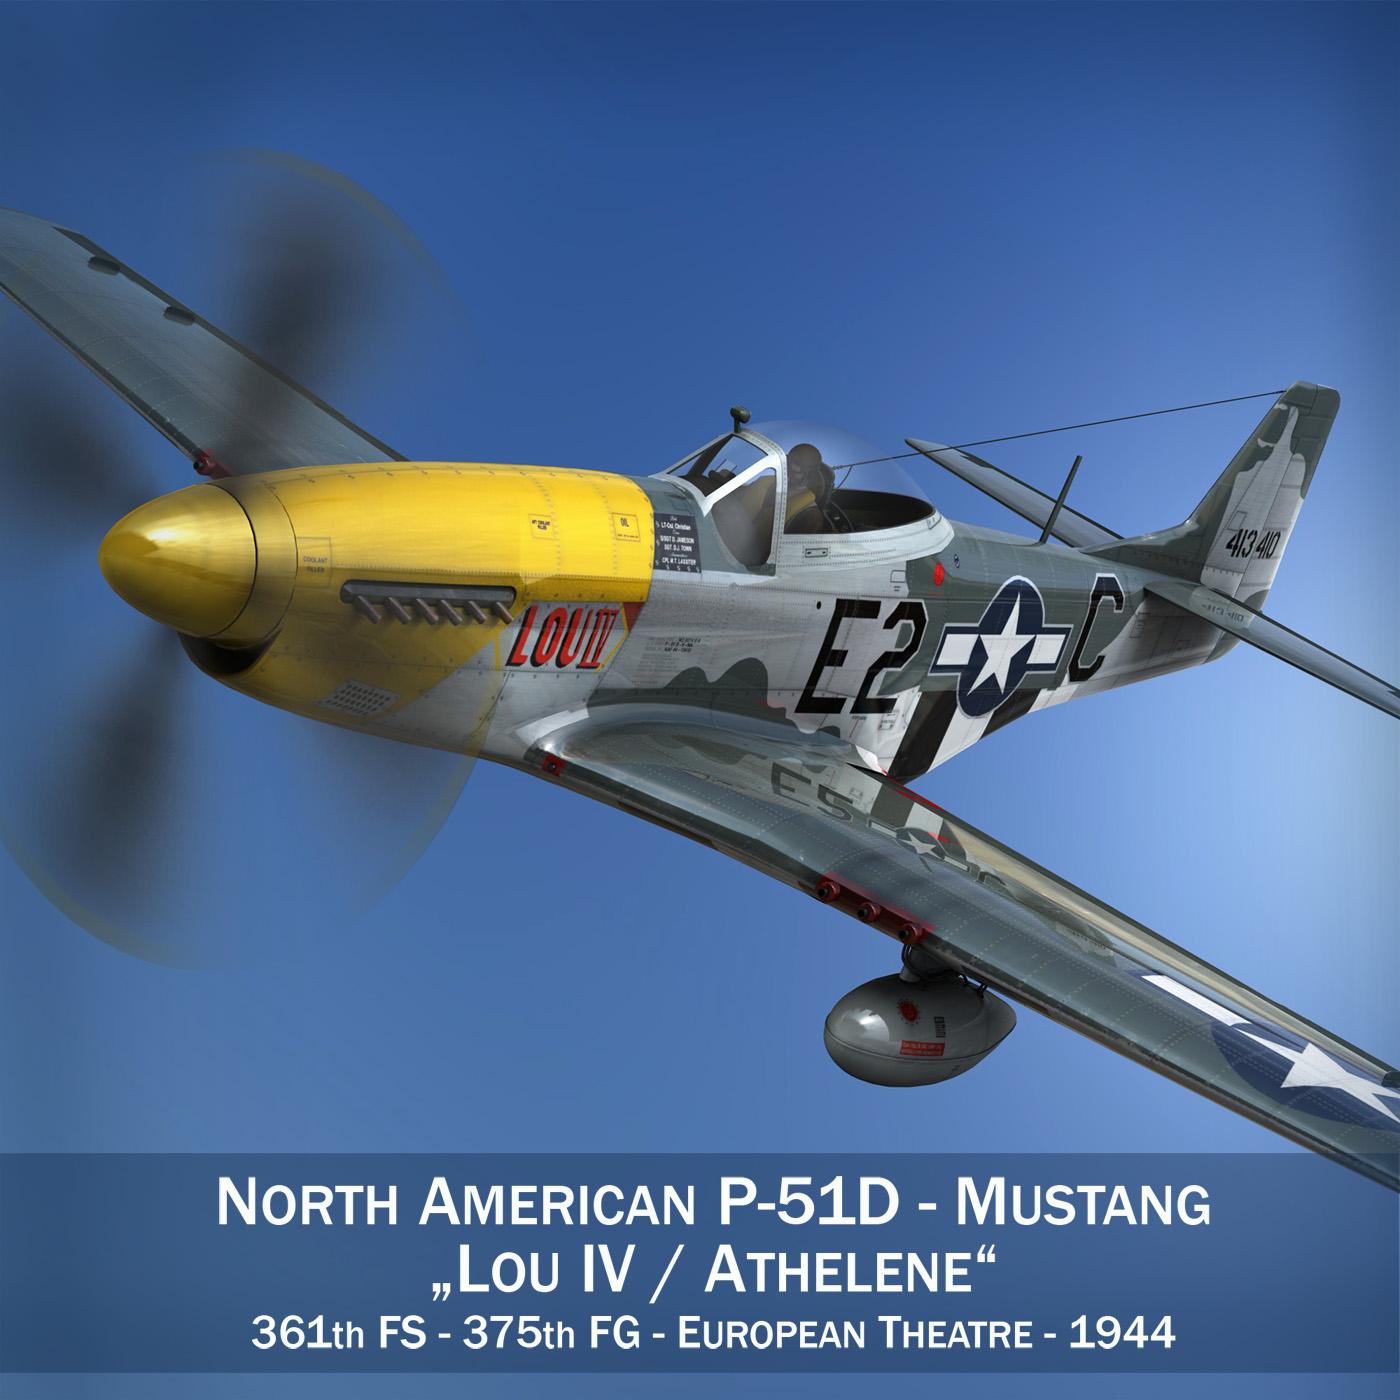 north american p-51d mustang – lou iv 3d model fbx c4d lwo obj 272598